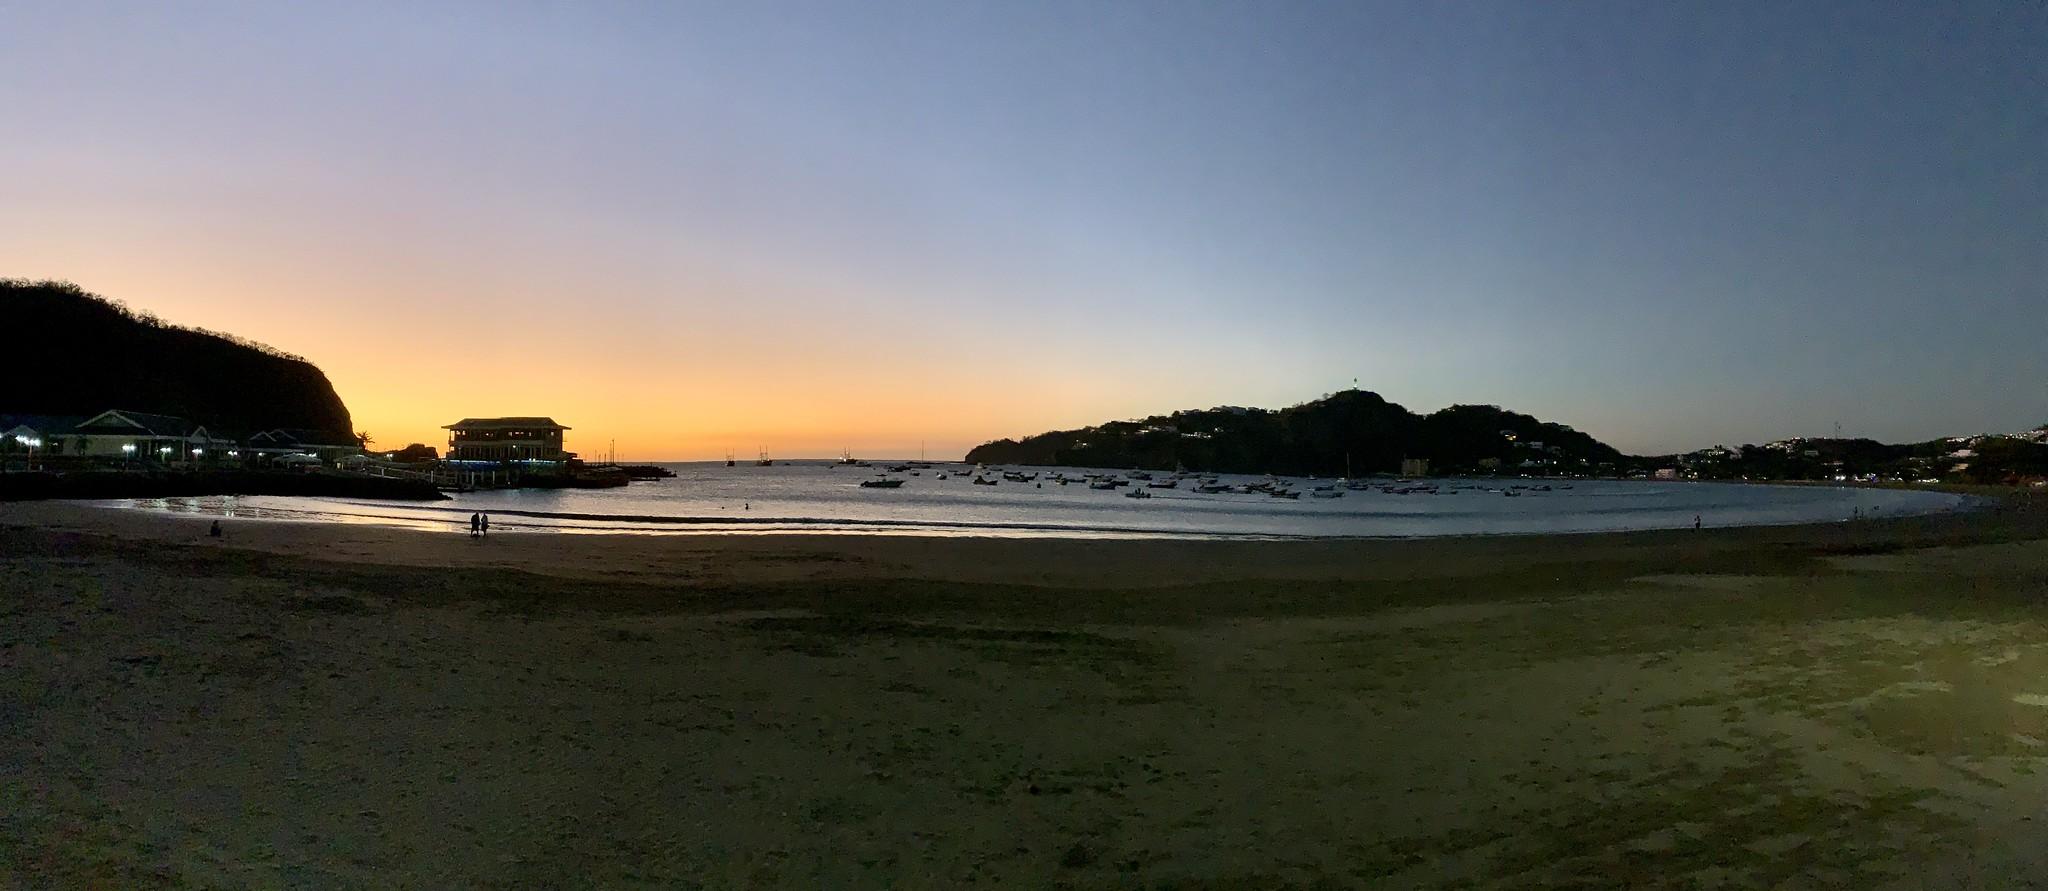 San Juan Del Sur - [Nicaragua]